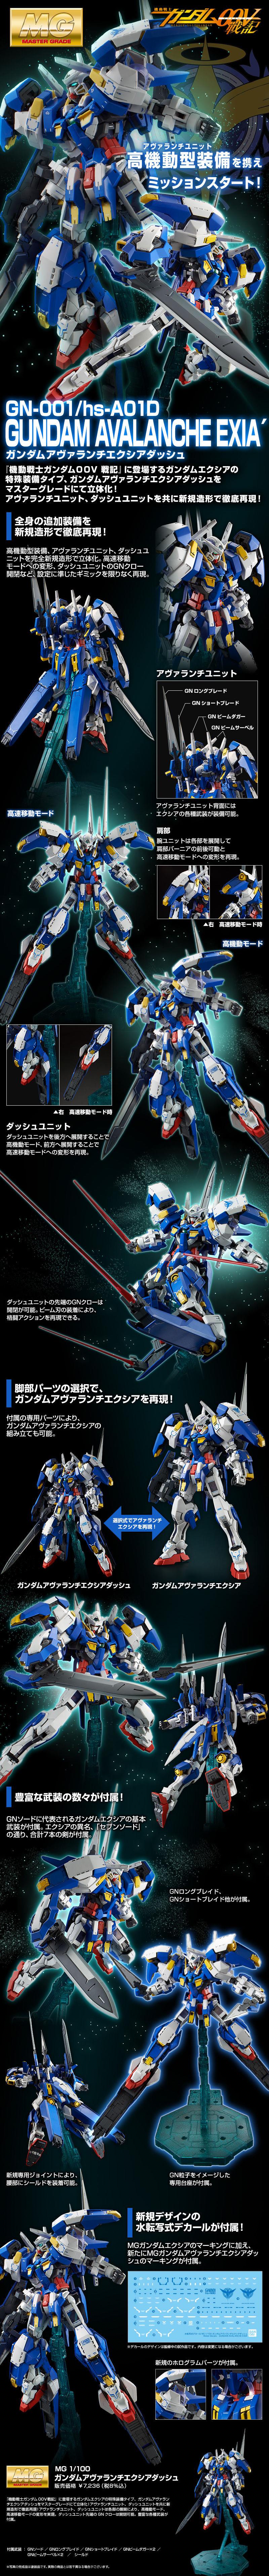 MG 1/100 GN-001/hs-A01D ガンダムアヴァランチエクシアダッシュ [Gundam Avalanche Exia'] 公式商品説明(画像)